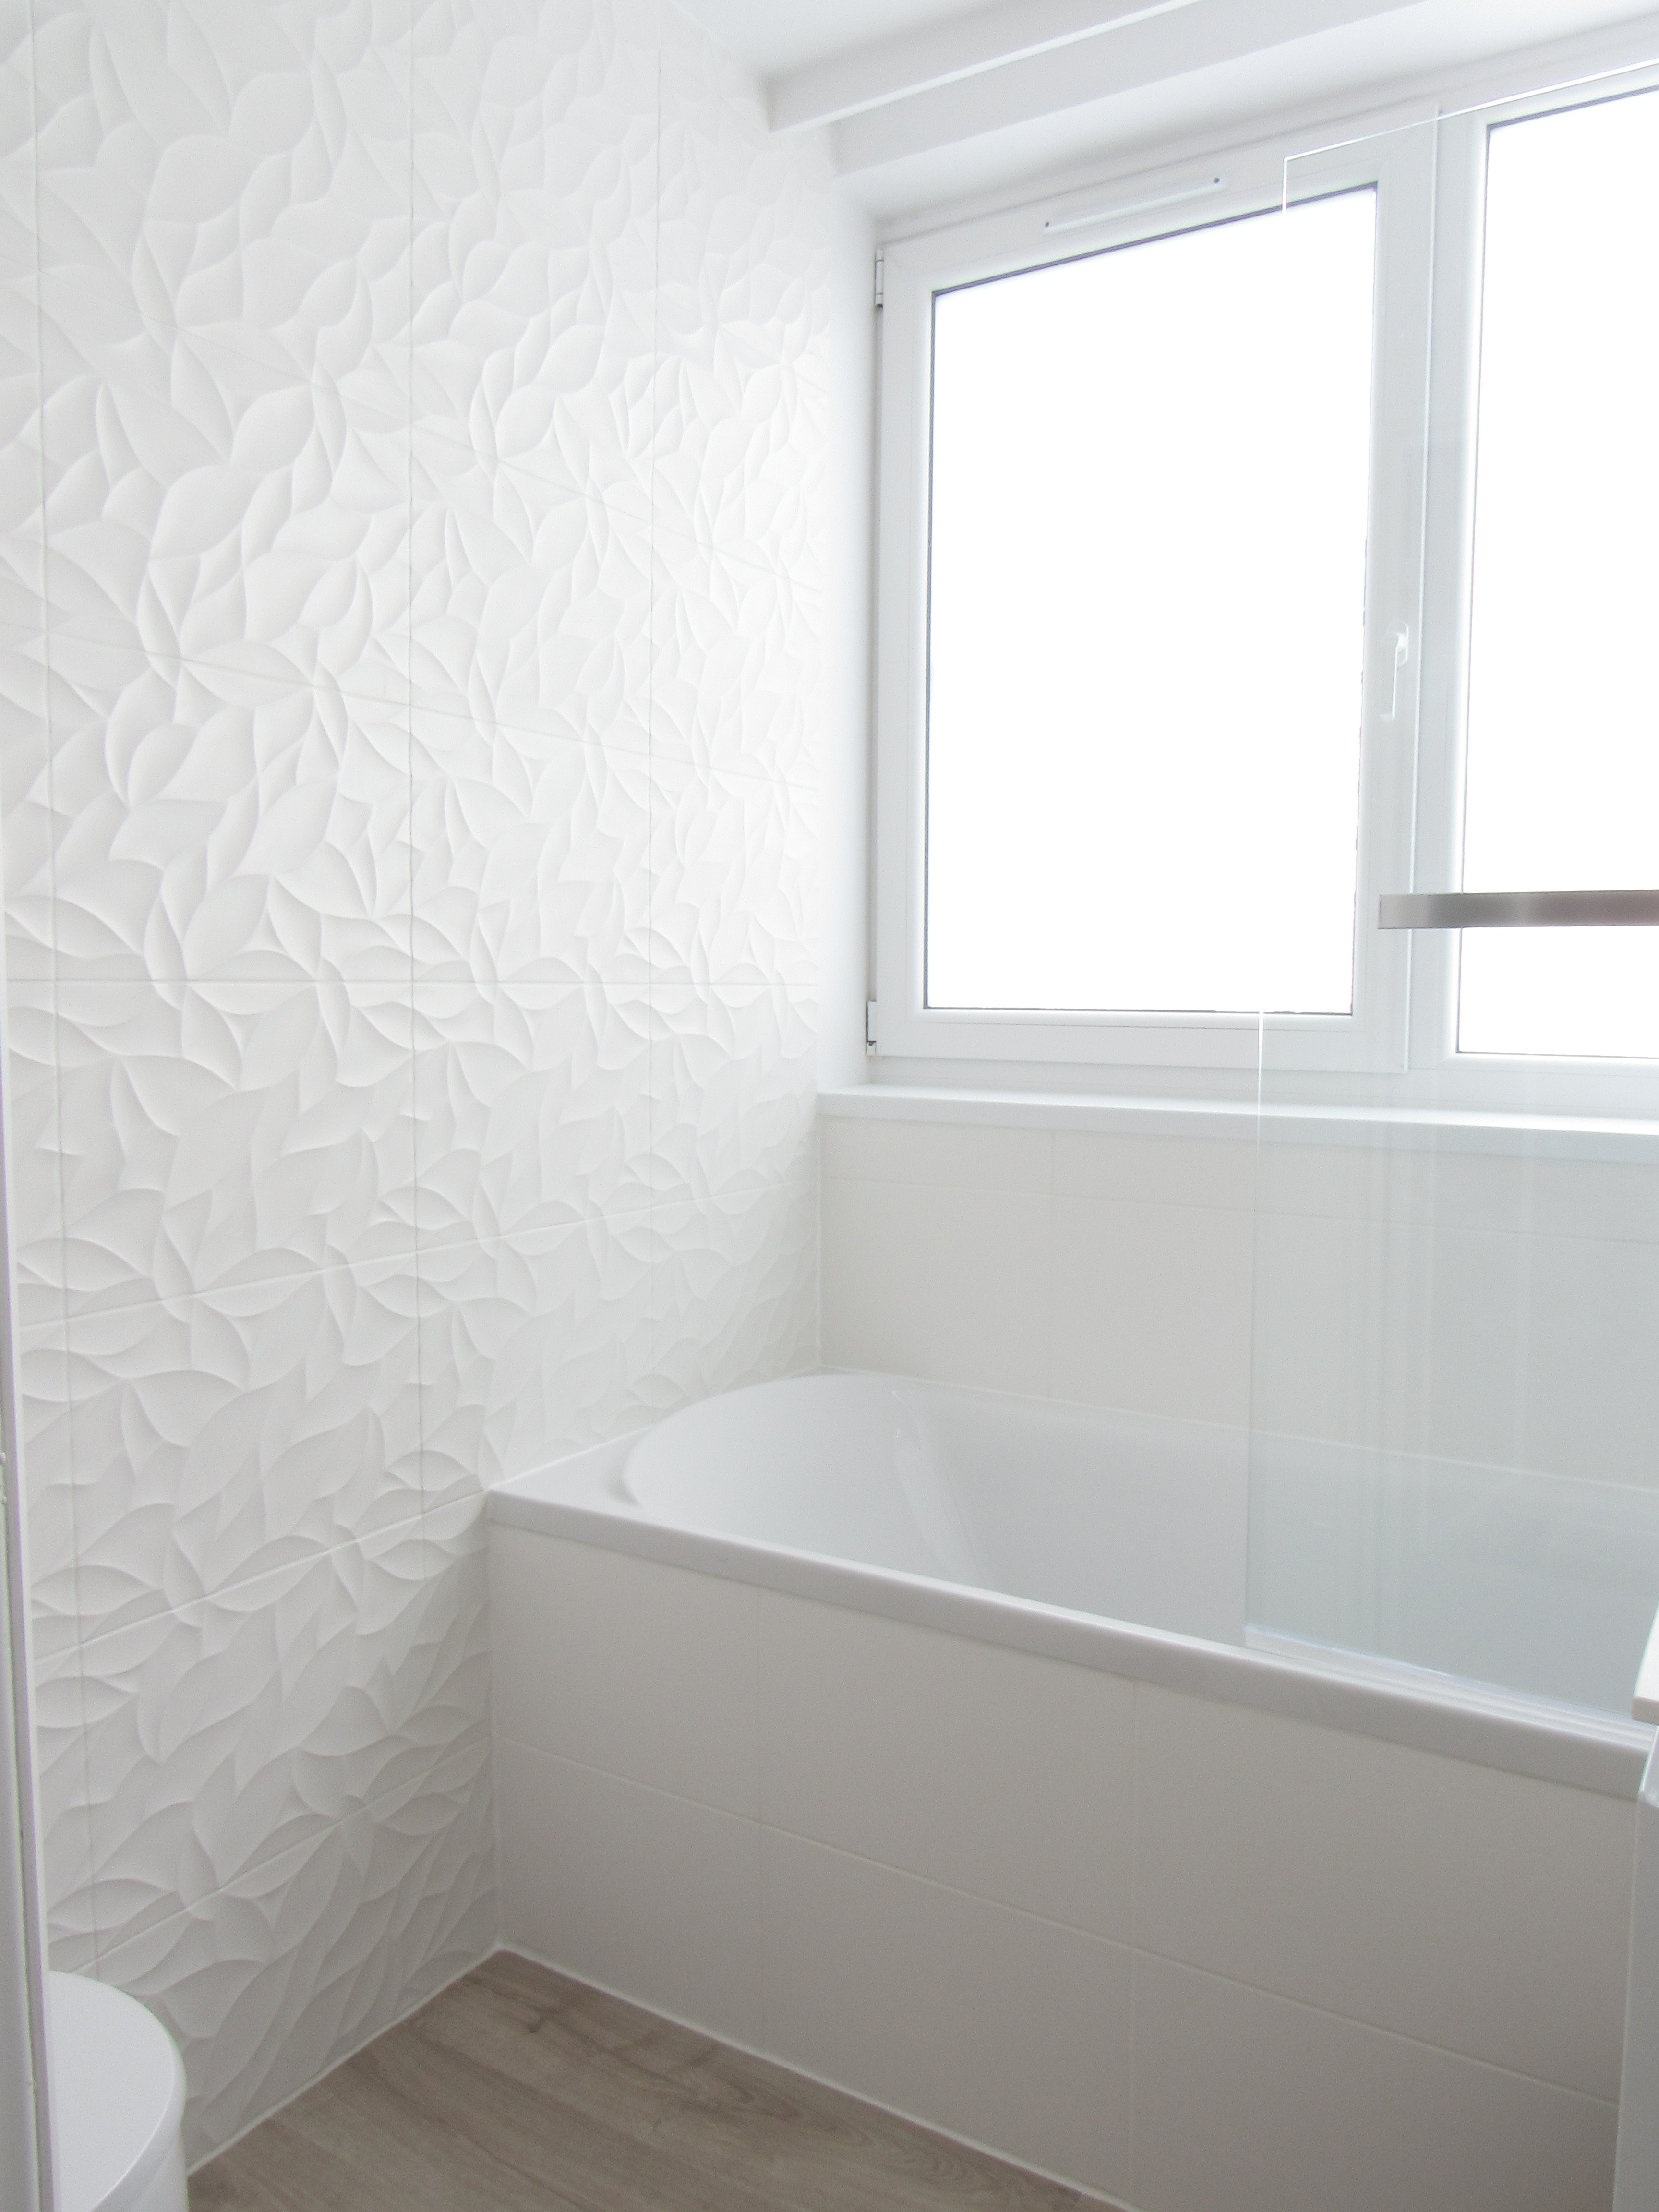 carrelage porcelanosa oxo deco blanco l d int rieur. Black Bedroom Furniture Sets. Home Design Ideas